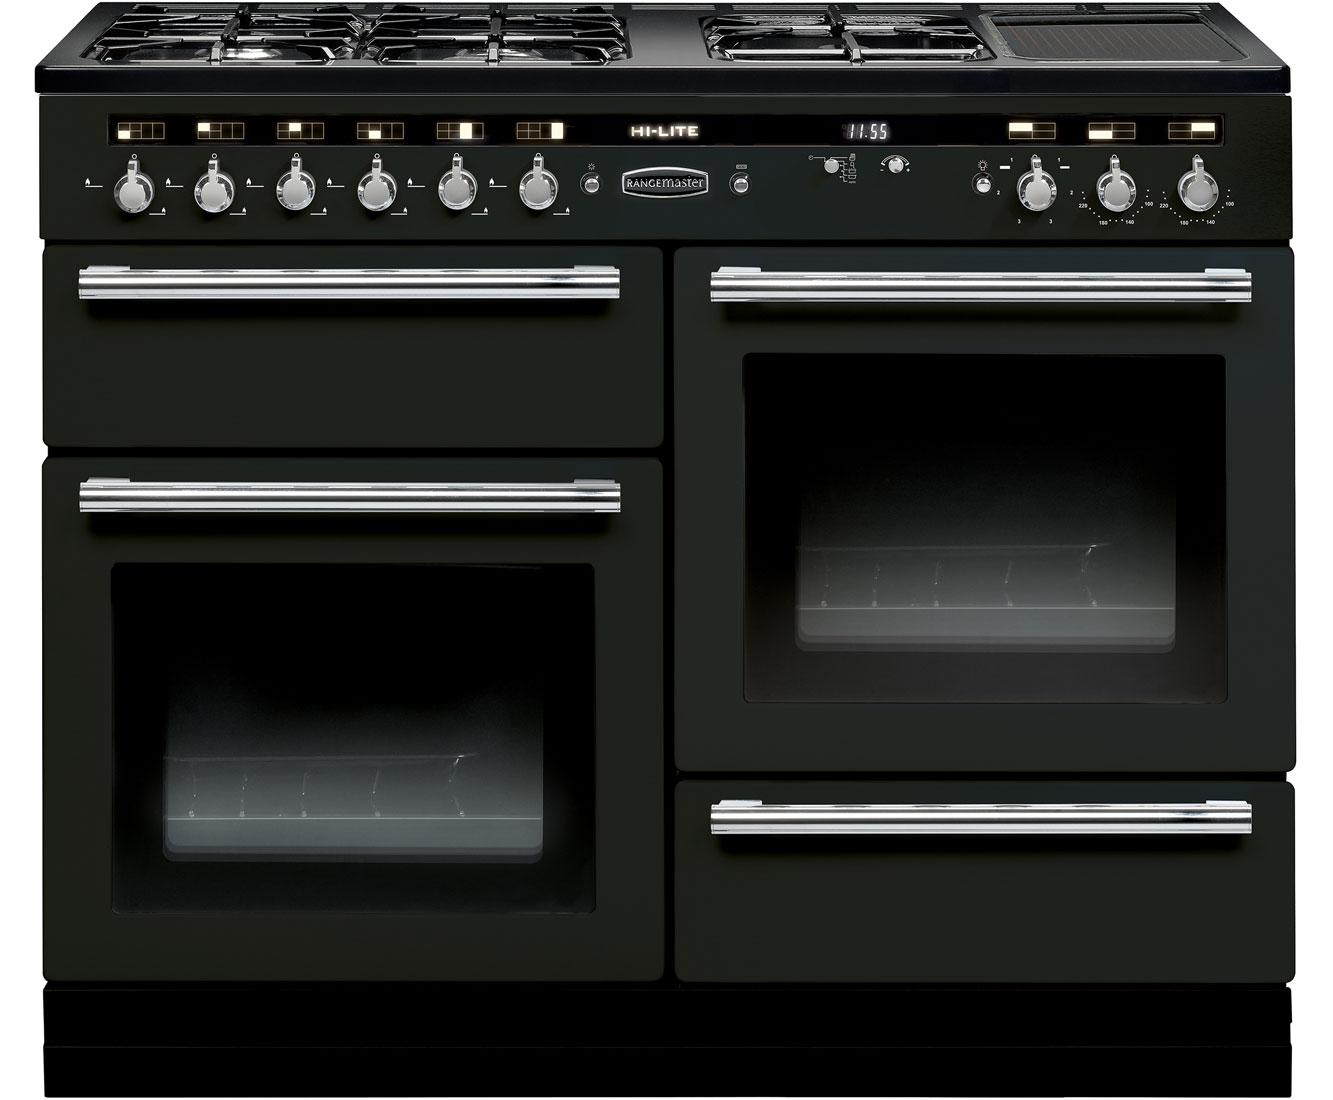 Rangemaster Hi-Lite HLT110DFFBL/C 110cm Dual Fuel Range Cooker Review